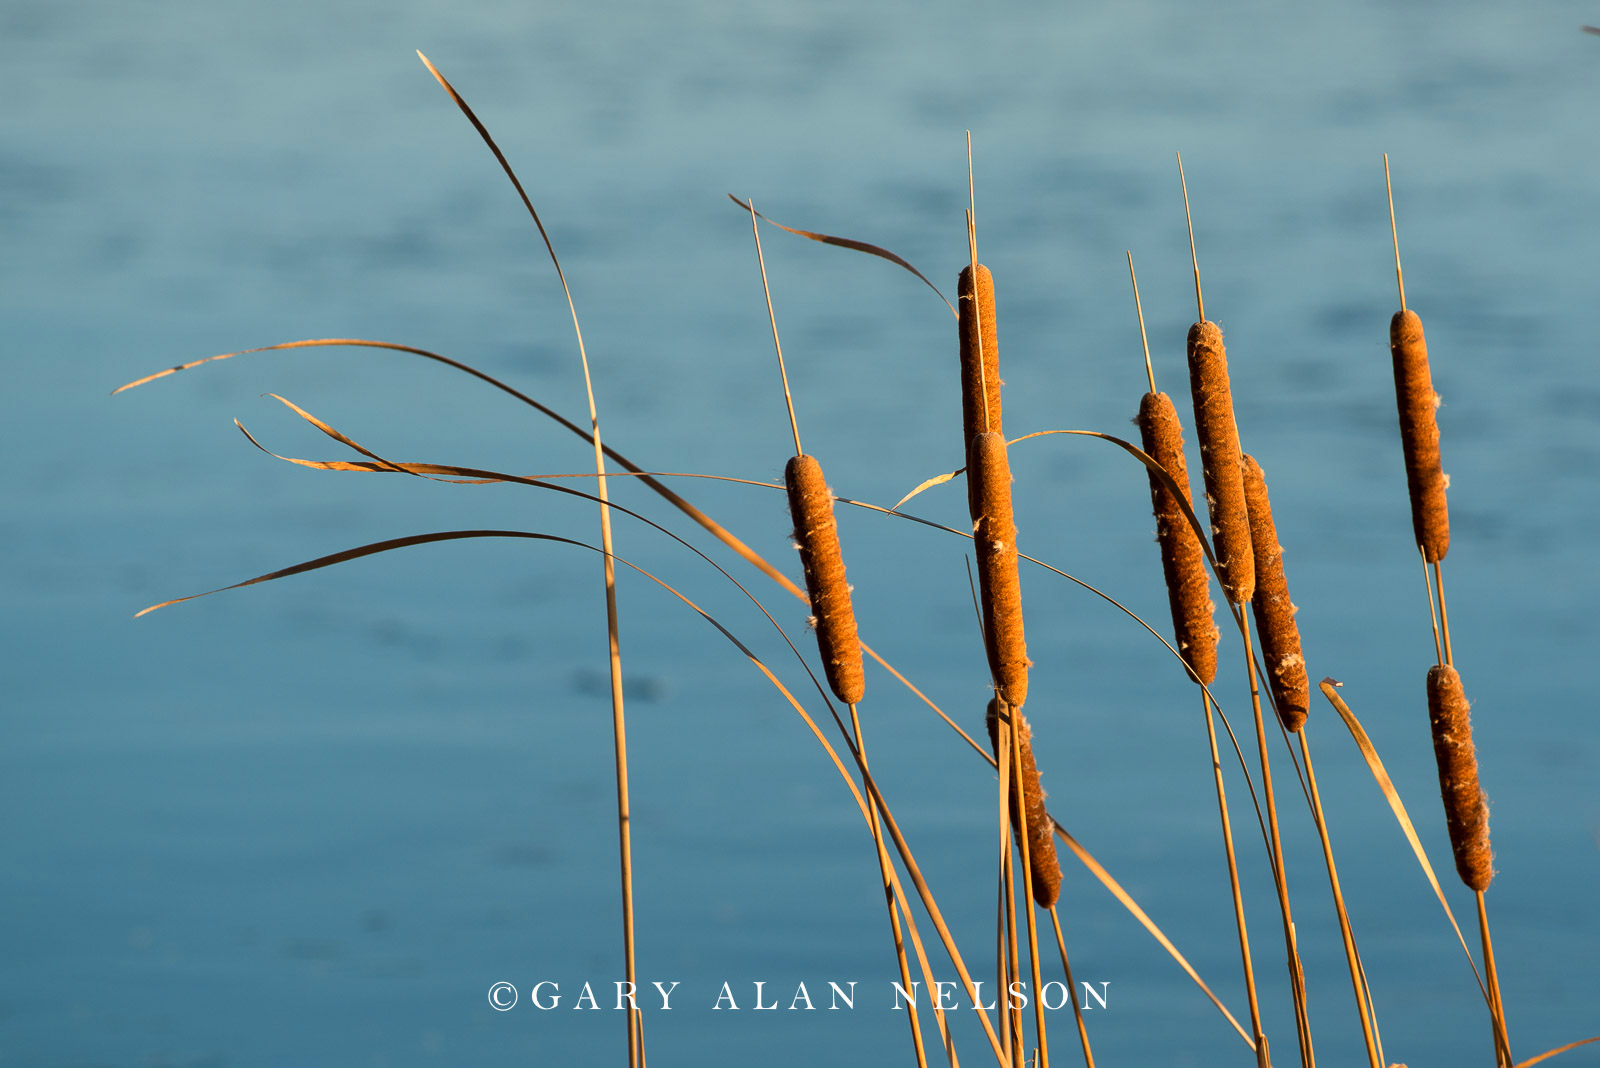 Cattails on the shore of North Center Lake, Allemansratt Park, Lindstrom, Minnesota